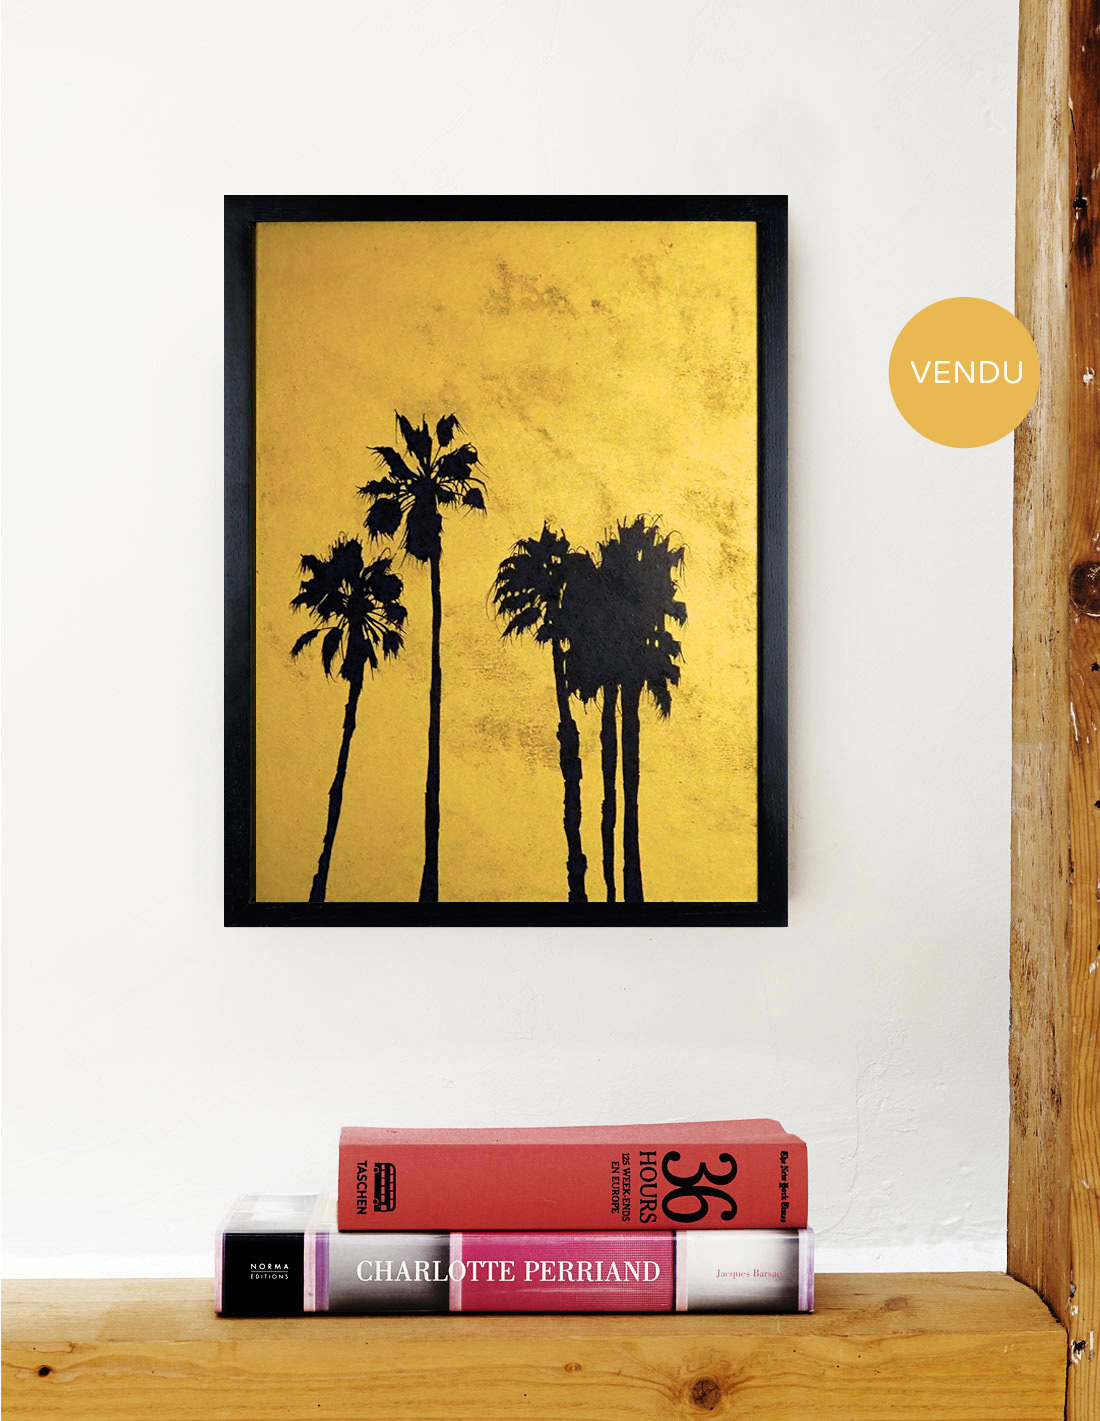 Hubert Jouzeau - Tableau - Moyens palmtrees Vendu